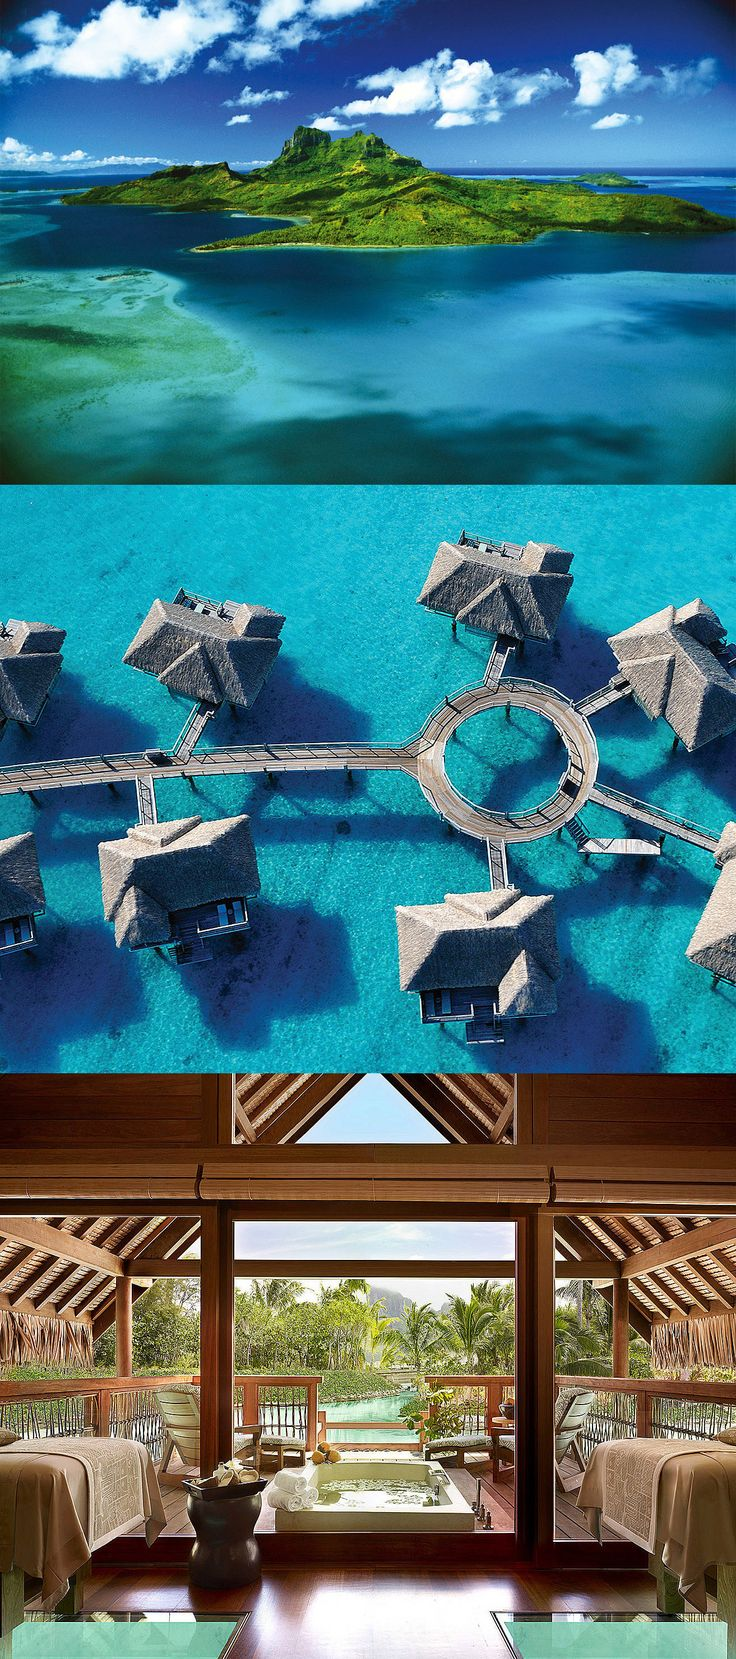 the Four Seasons Resort in Bora Bora.